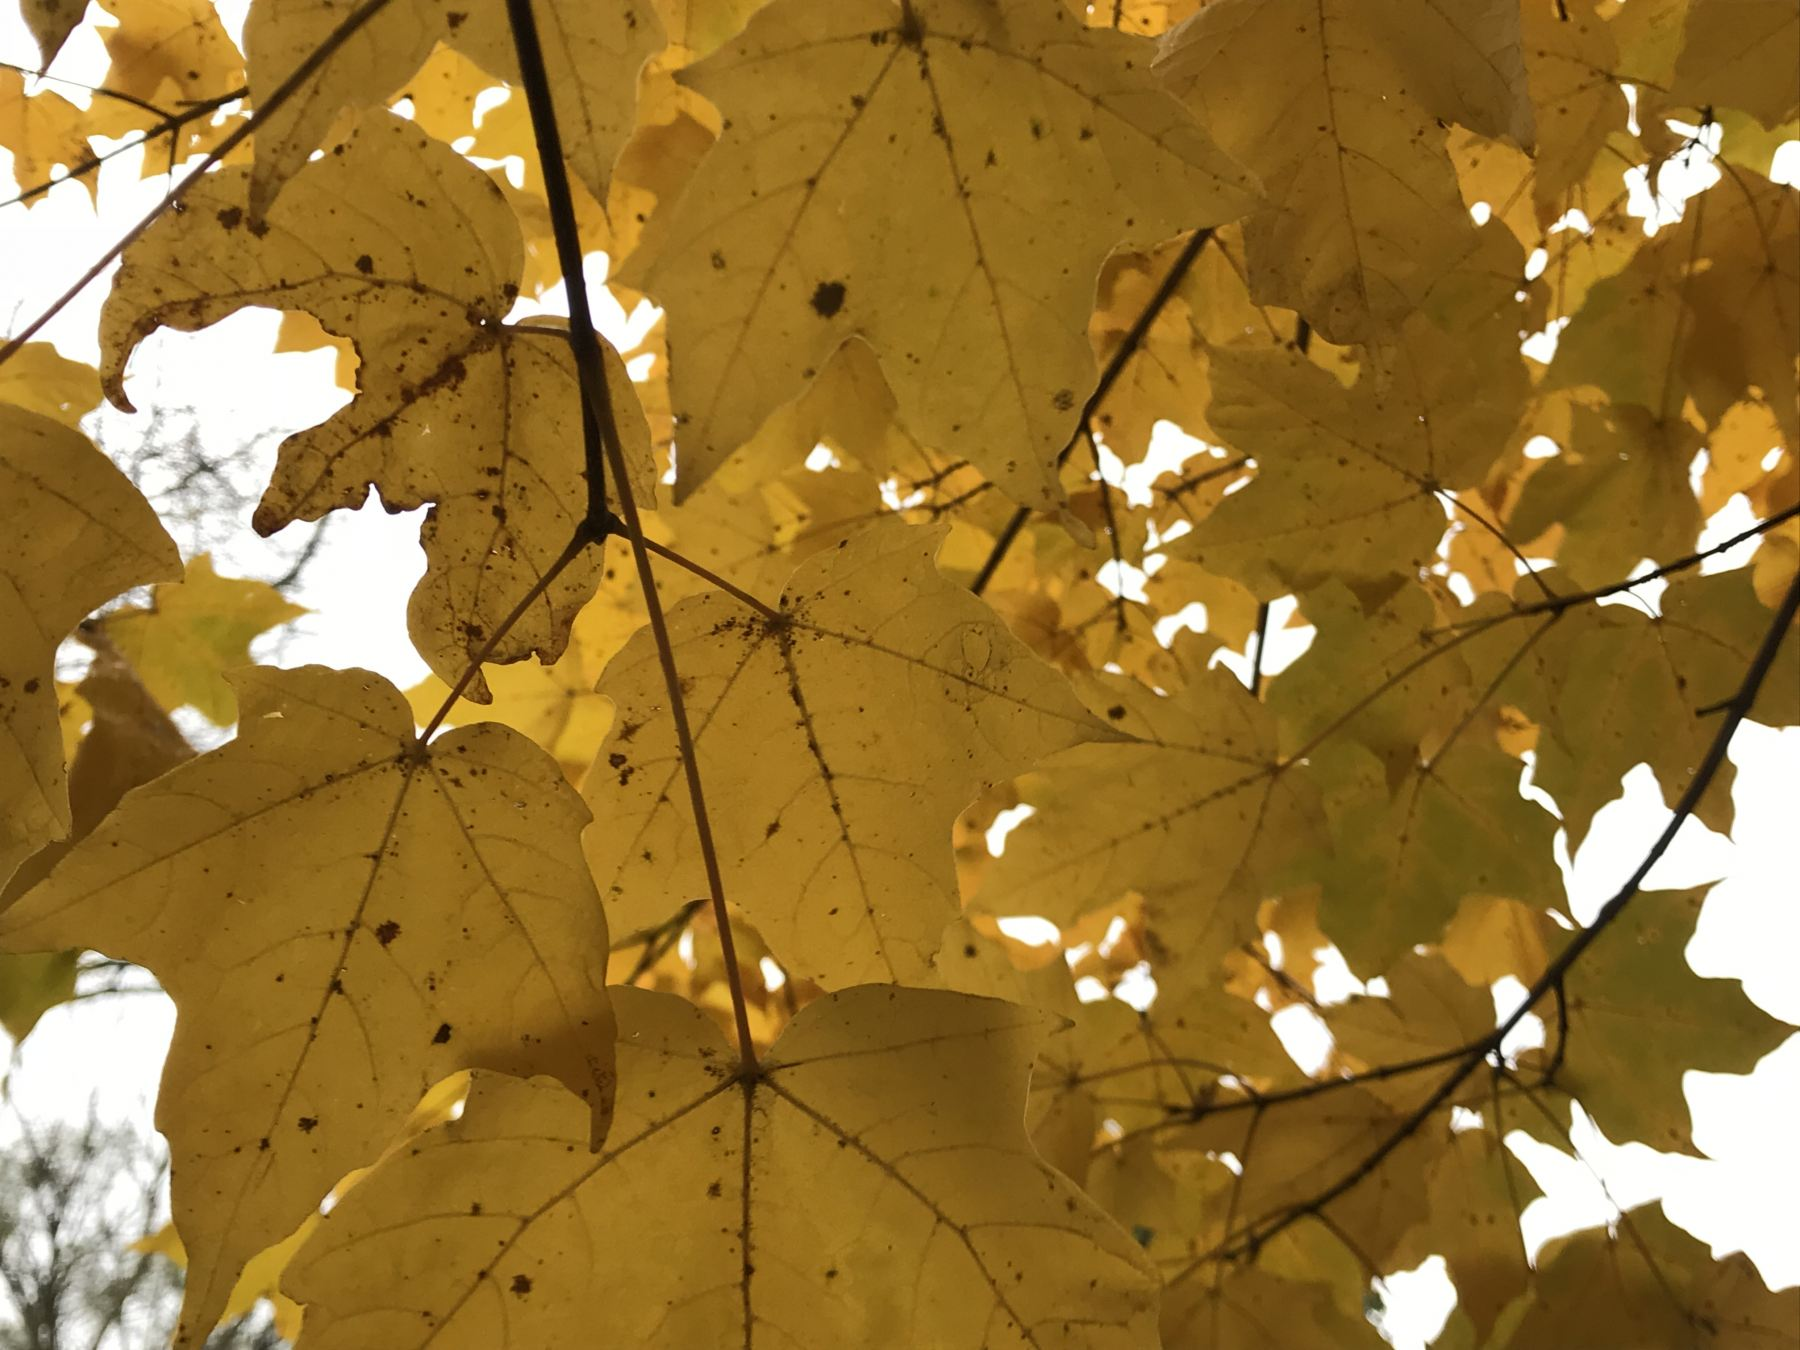 Sugar Maple Leaves in Fall